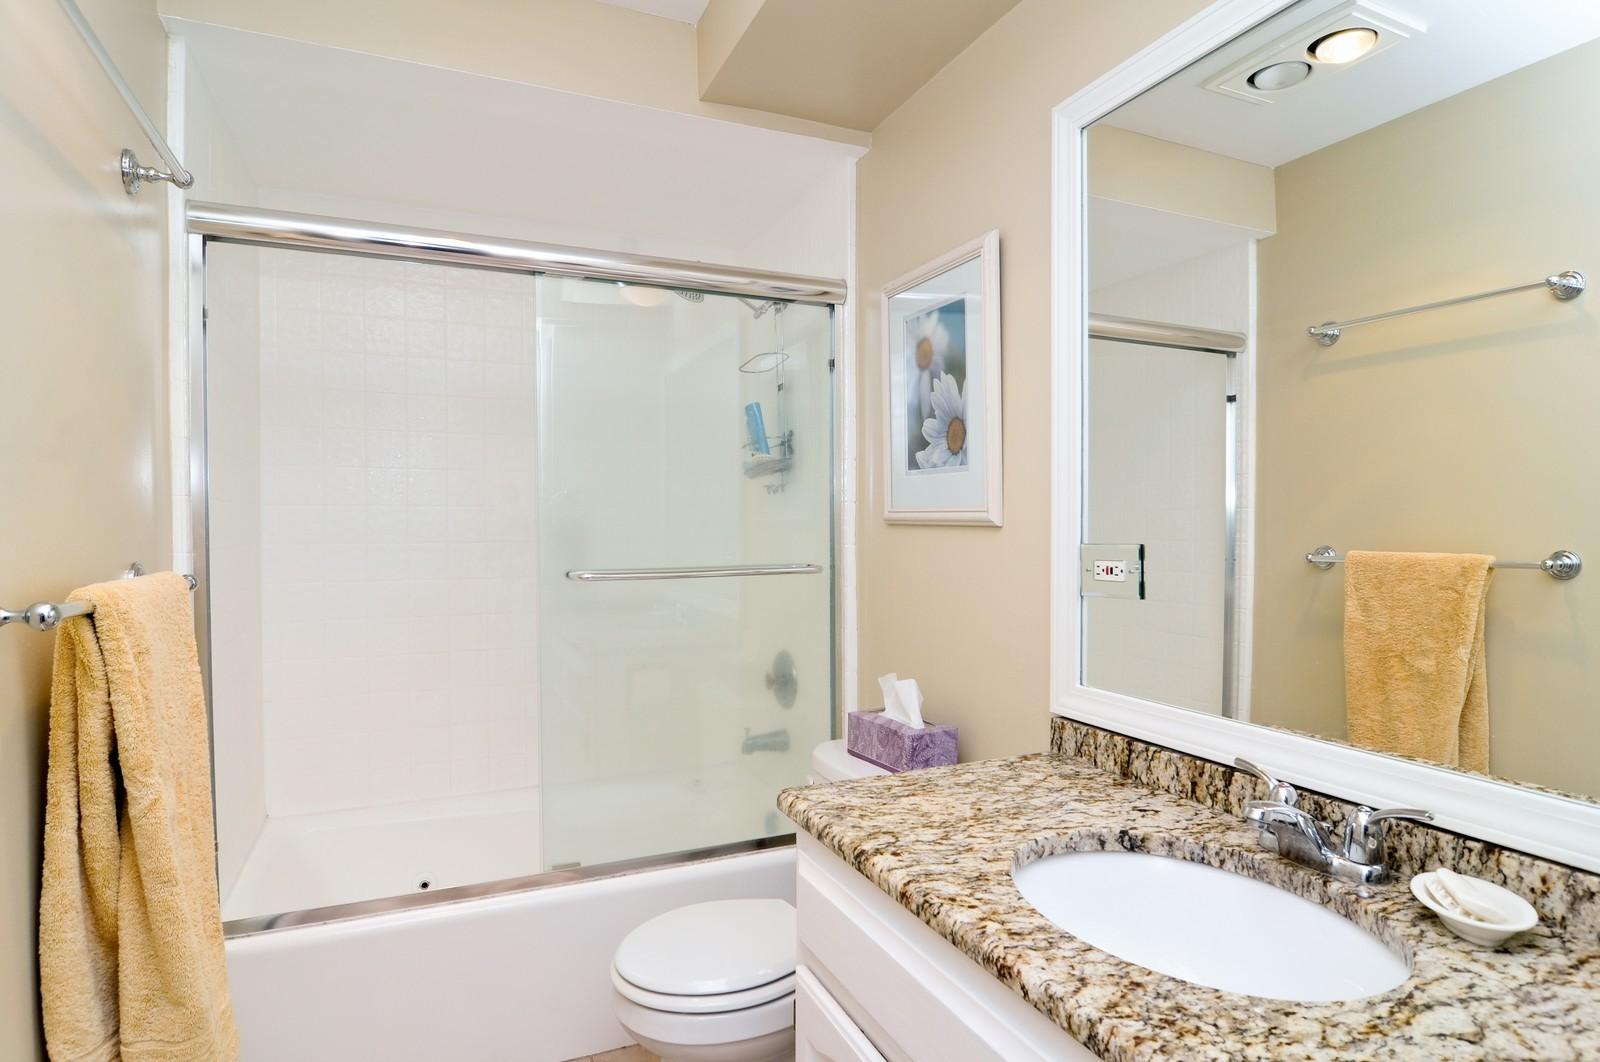 Real Estate Photography - 240 Sharon Dr, Barrington, IL, 60010 - 2nd Bathroom